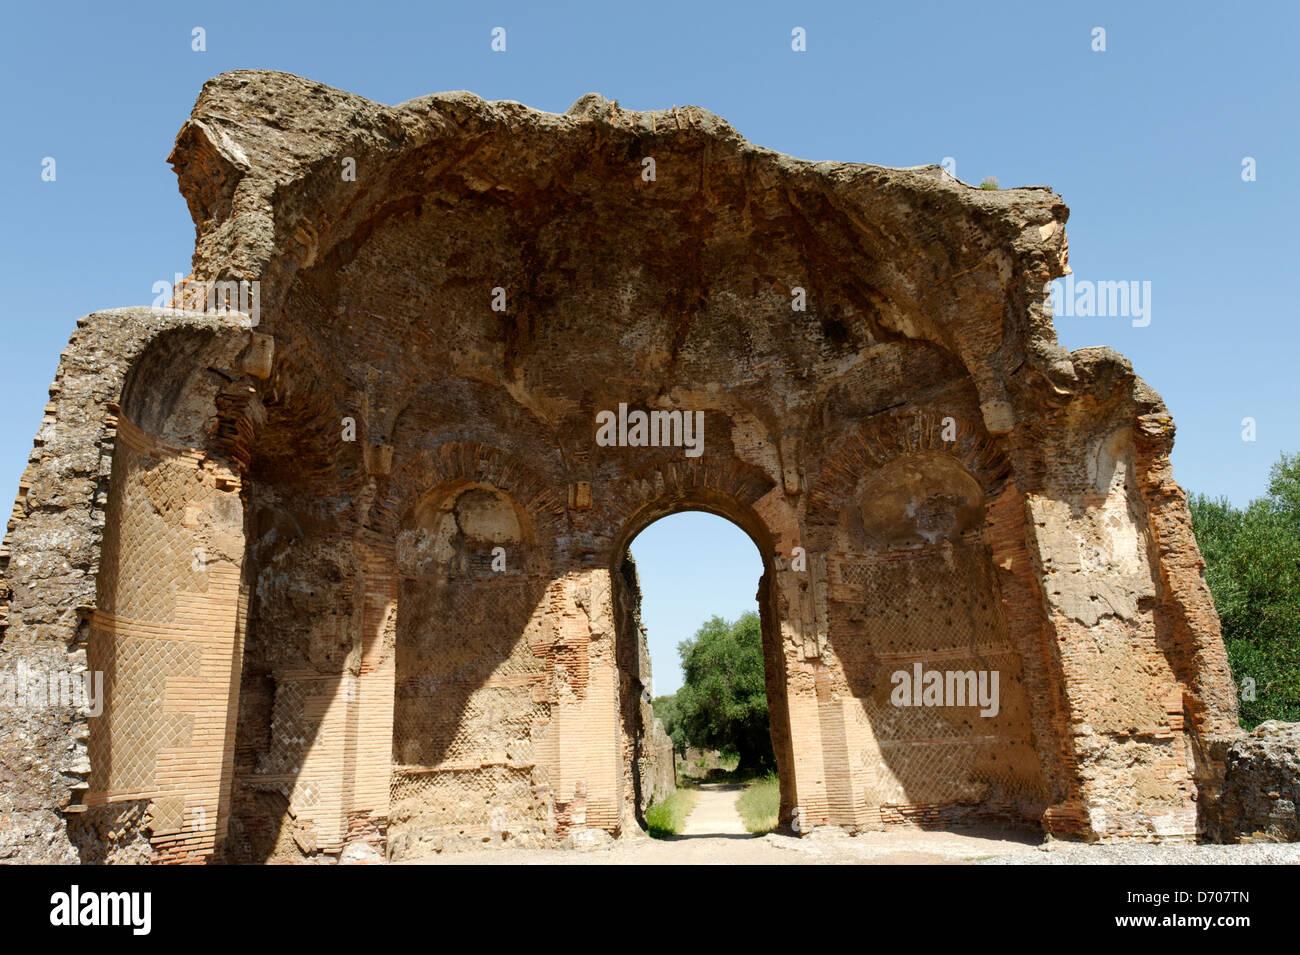 Villa Adriana. Tivoli. Italy. View of entrance Vestibulum of the Piazza d'Oro or Golden Square, so named because Stock Photo